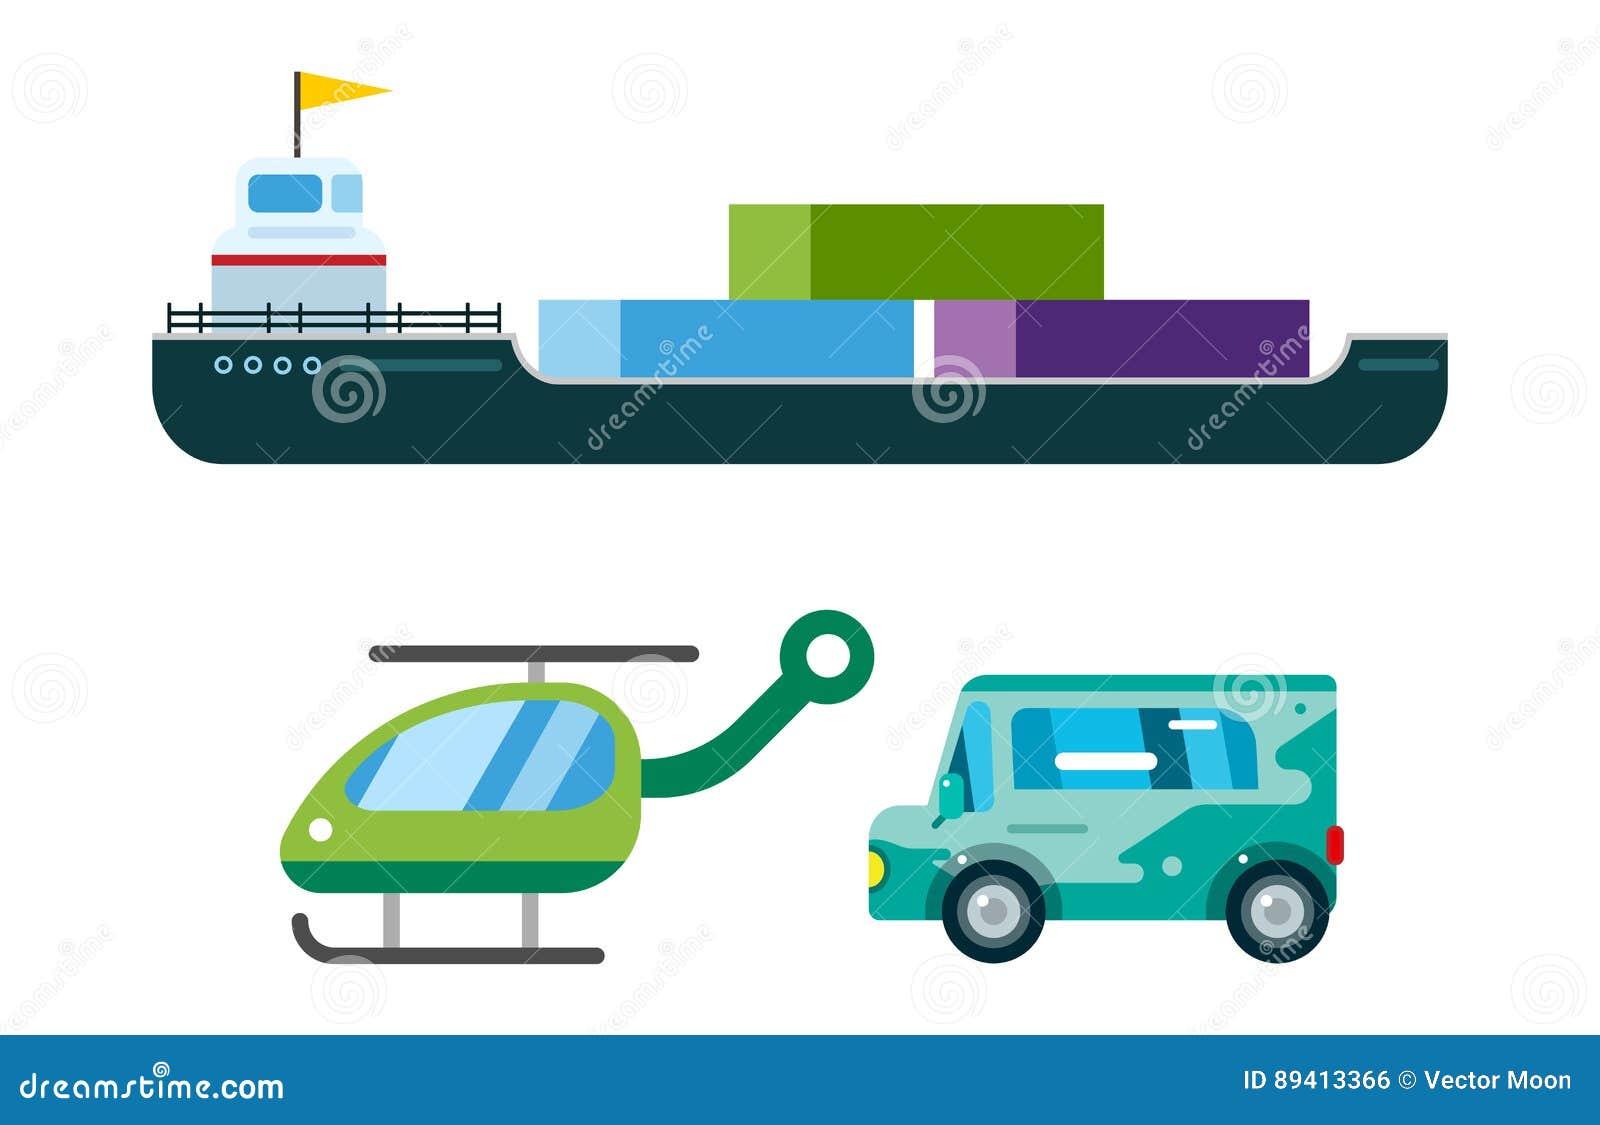 O vetor da entrega do transporte isolou o petroleiro branco do ícone da silhueta do navio do helicóptero do carro de bombeiros da